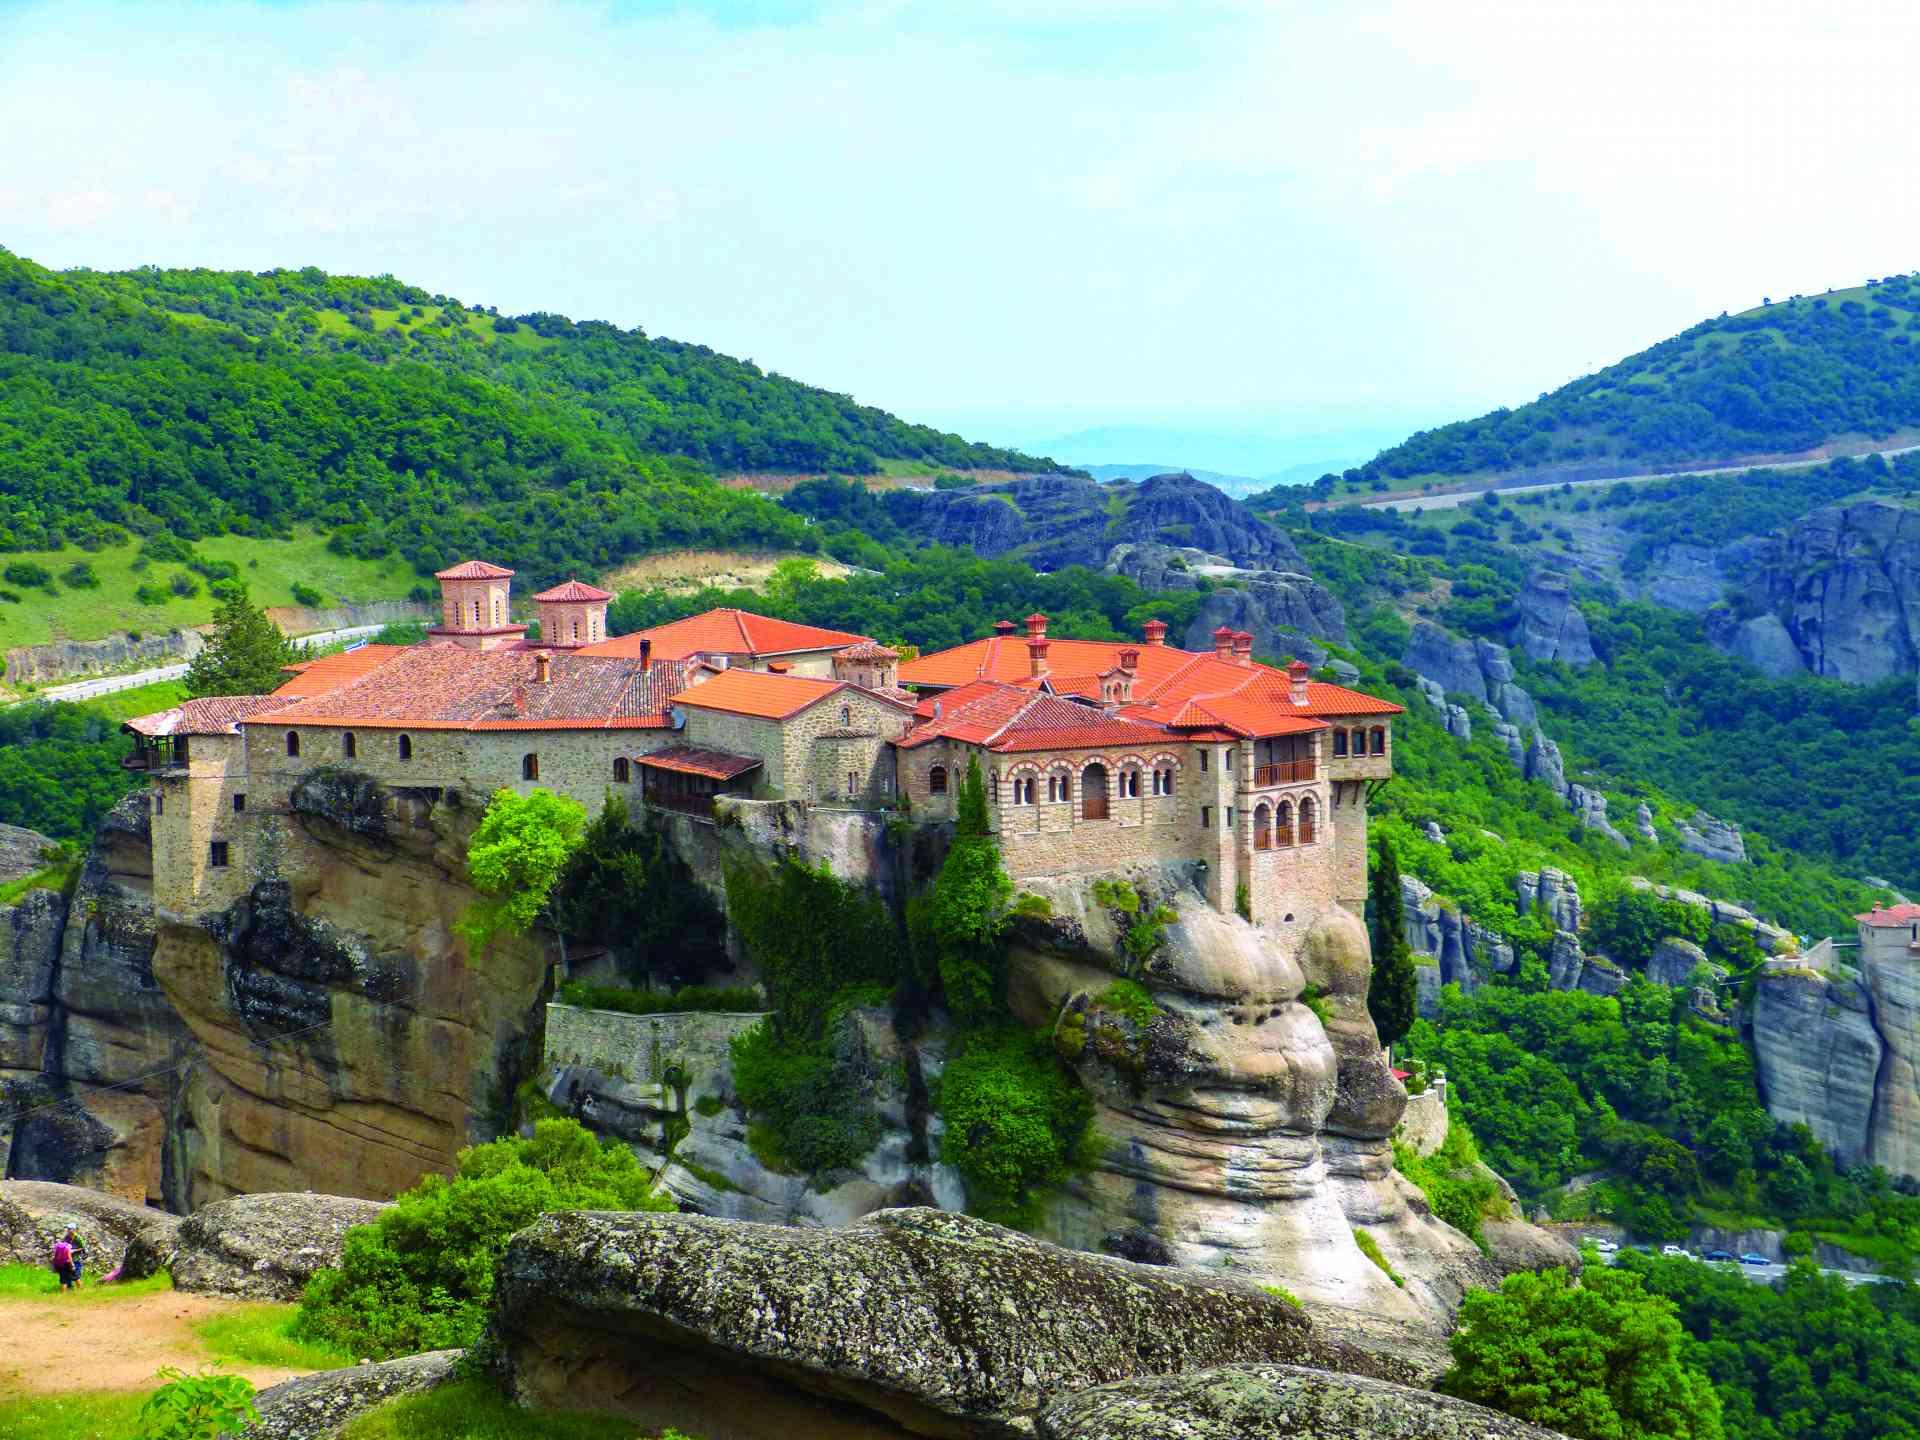 Monasteries of Meteora, Greece by Sacha Bunnik